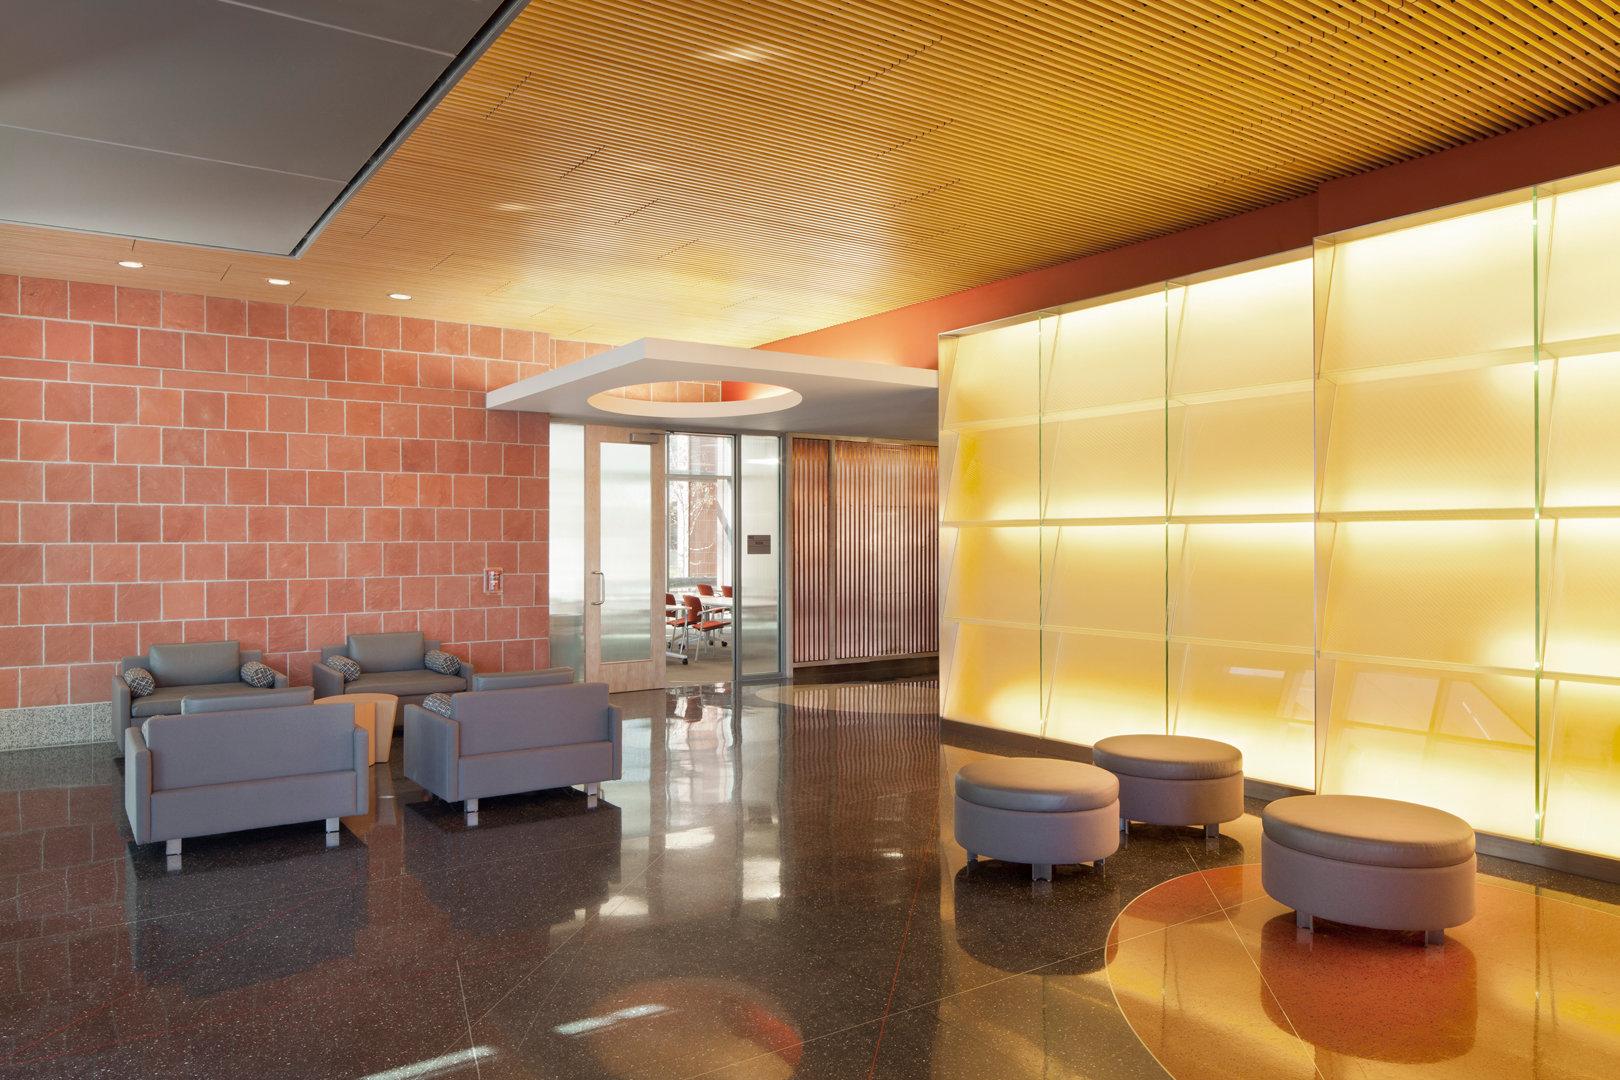 University of Arizona, MRB Lobby